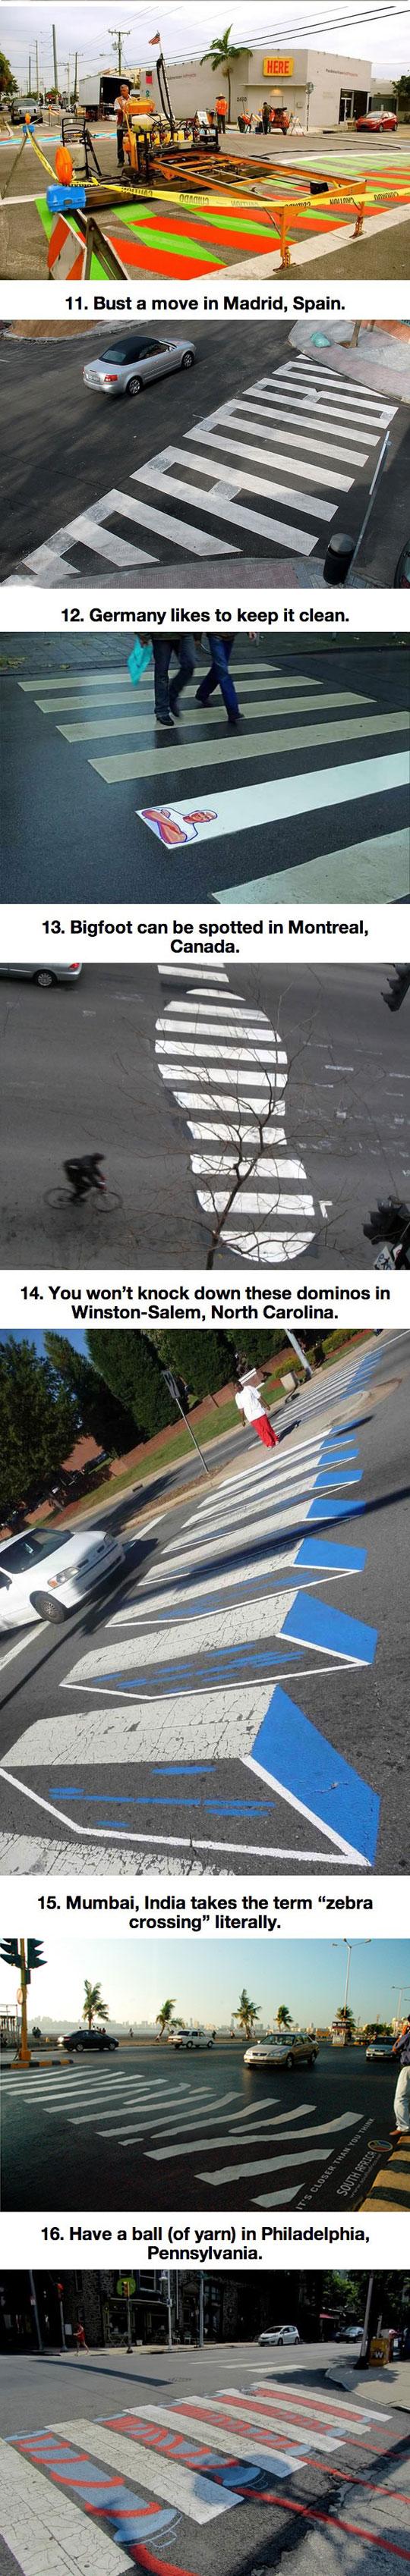 cool-crosswalk-artwork-3D-footprint